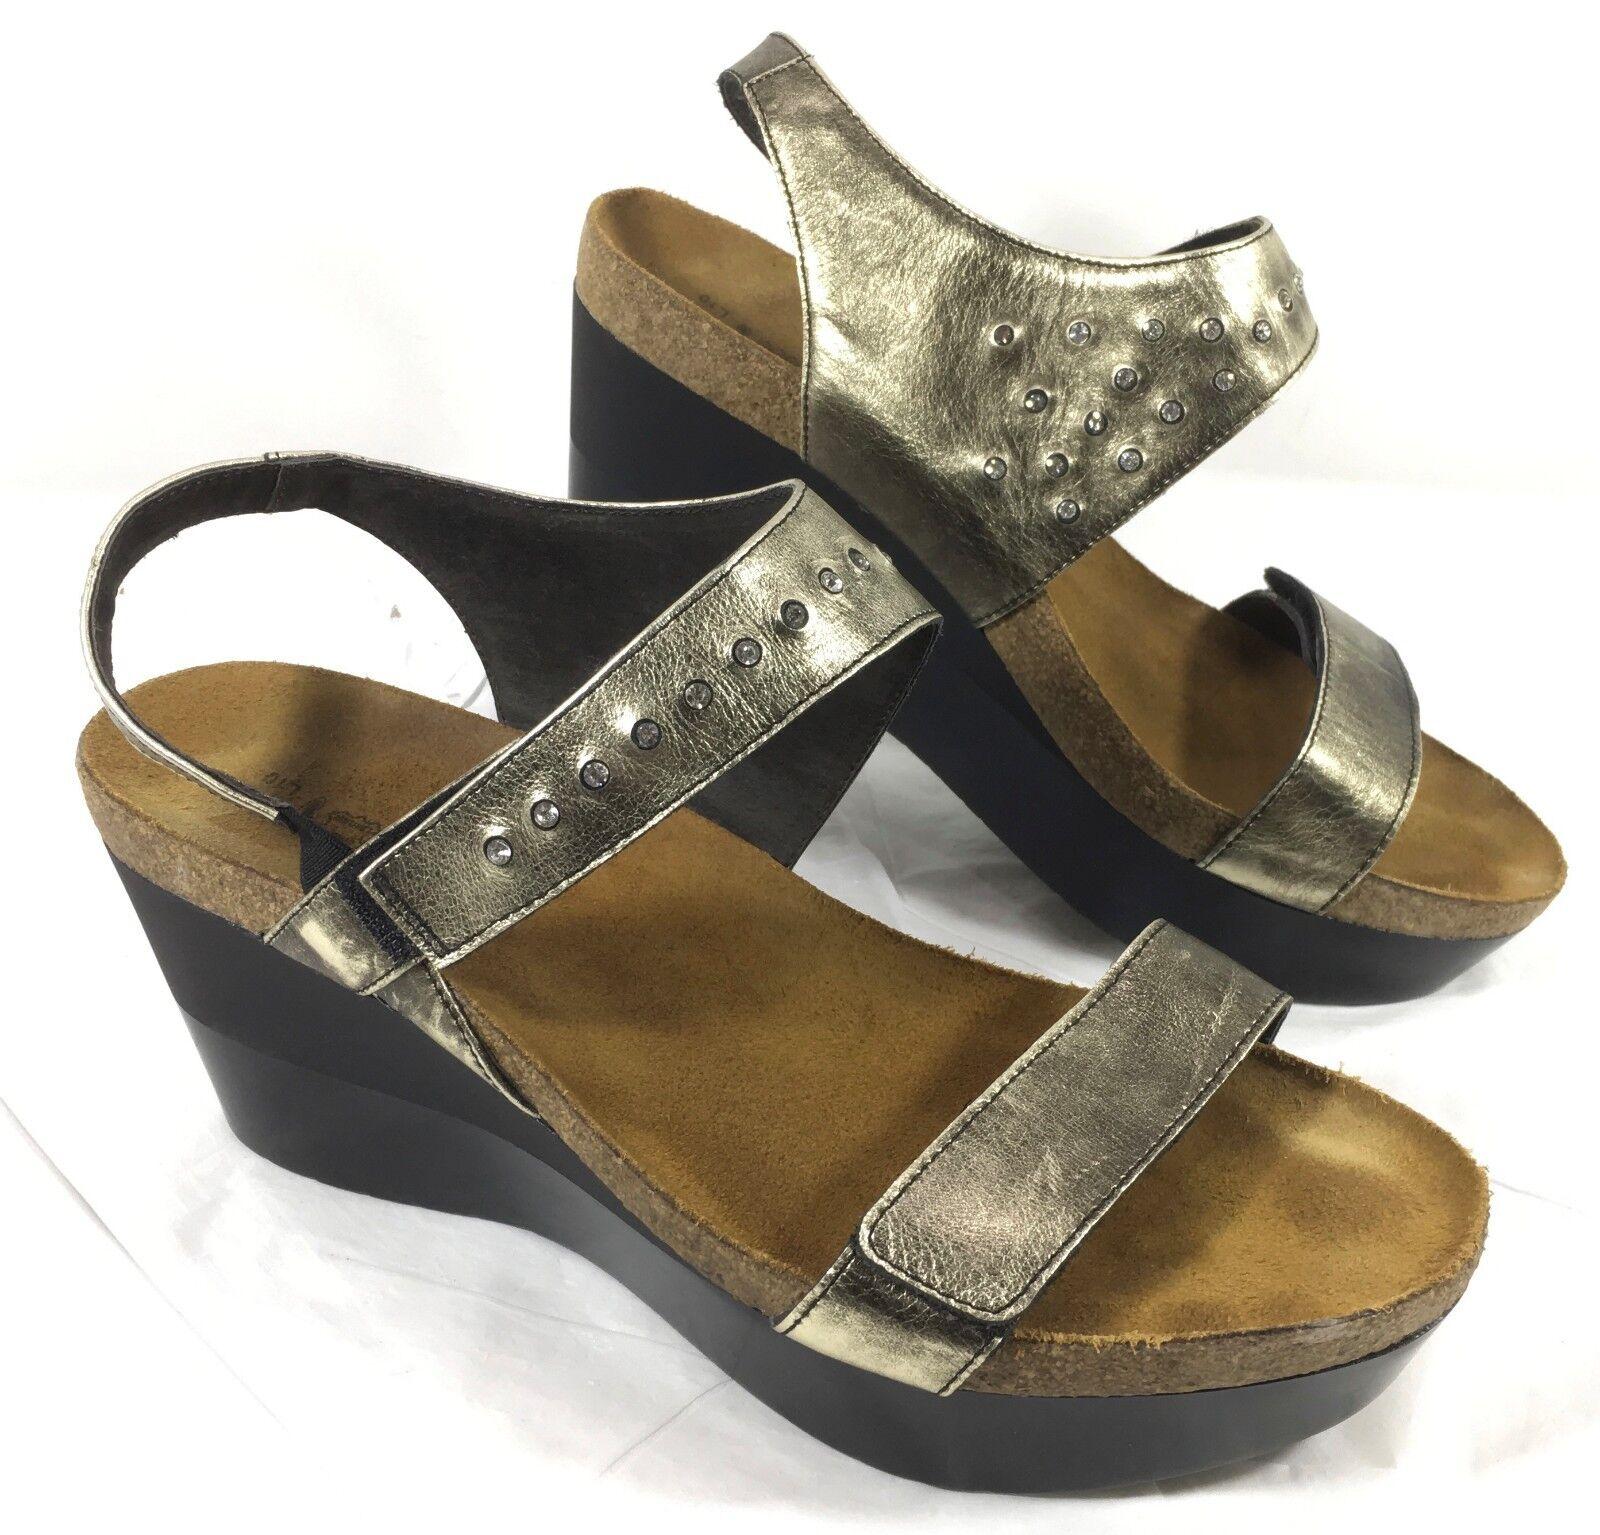 EUC NAOT PRODIGY Platform Pewter Metal color Sandals   heels Sz 41 US 10